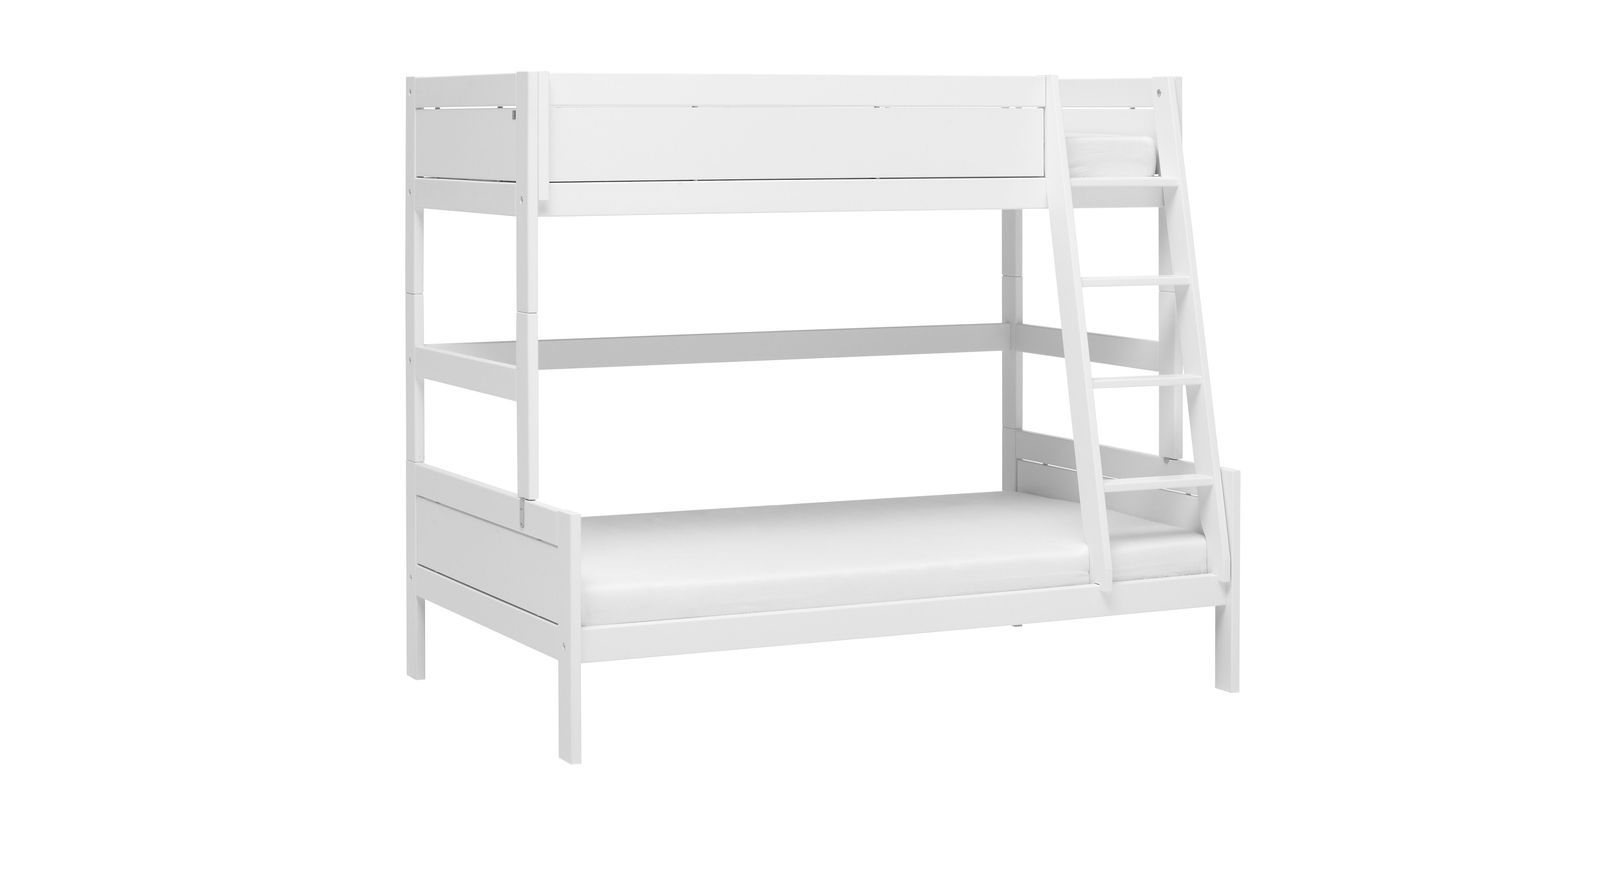 LIFETIME Familienbett Original aus weiß lackiertem Holz